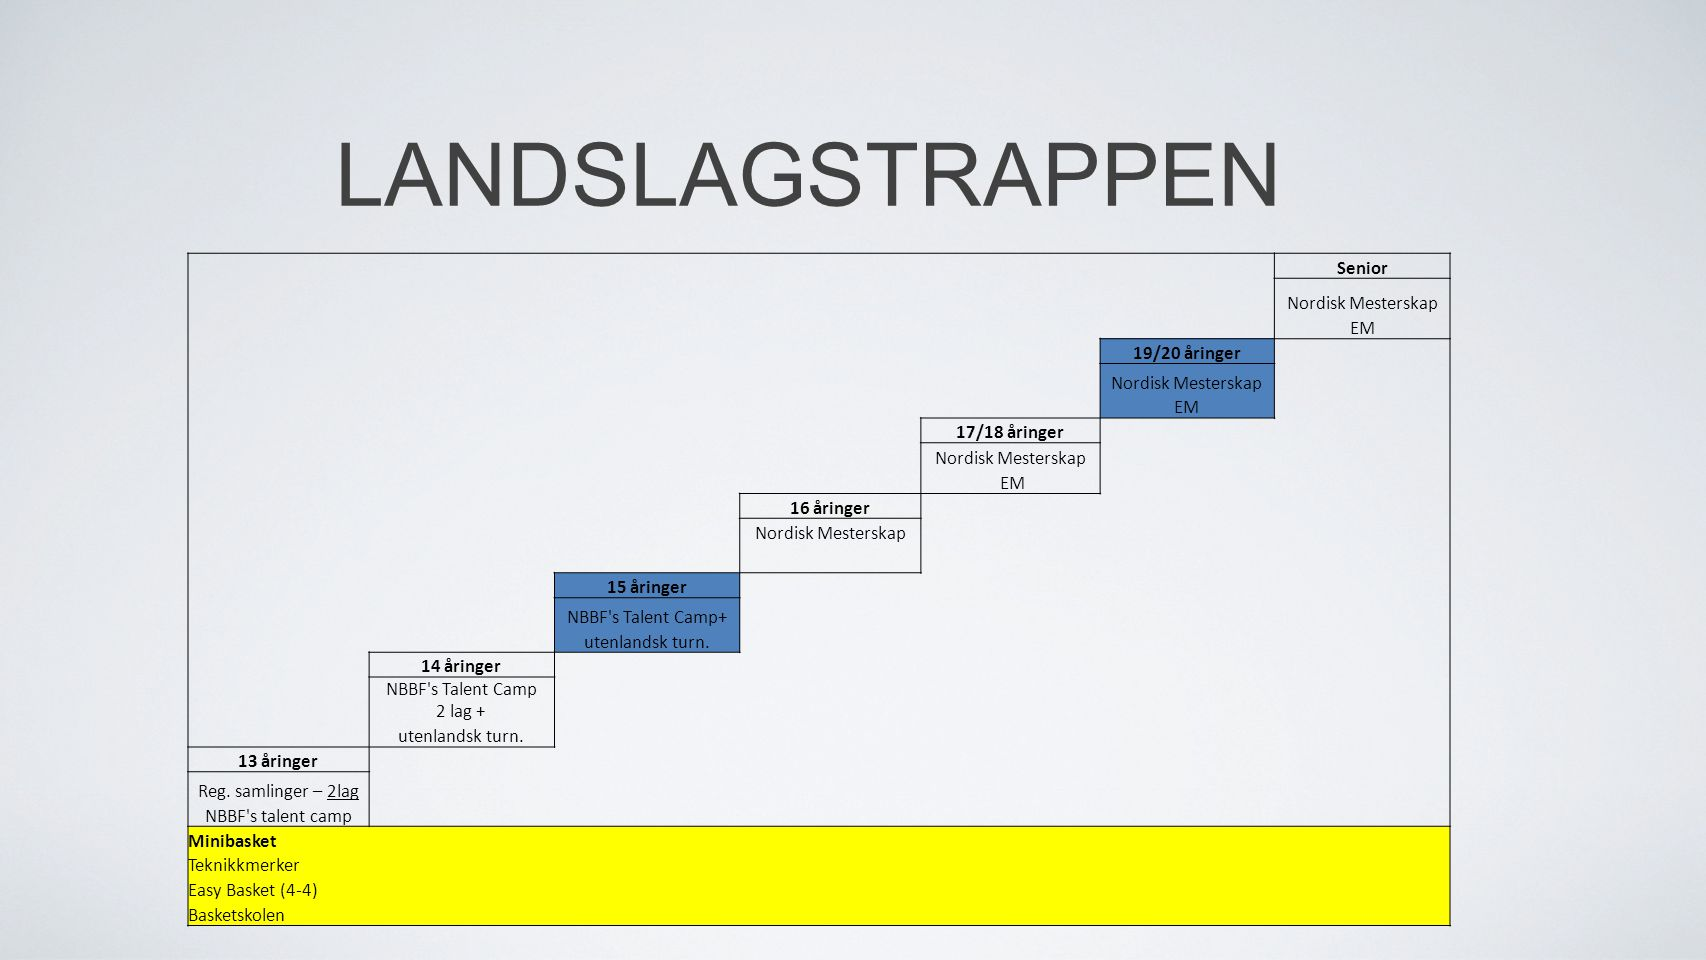 LANDSLAGSTRAPPEN Senior Nordisk Mesterskap EM 19/20 åringer